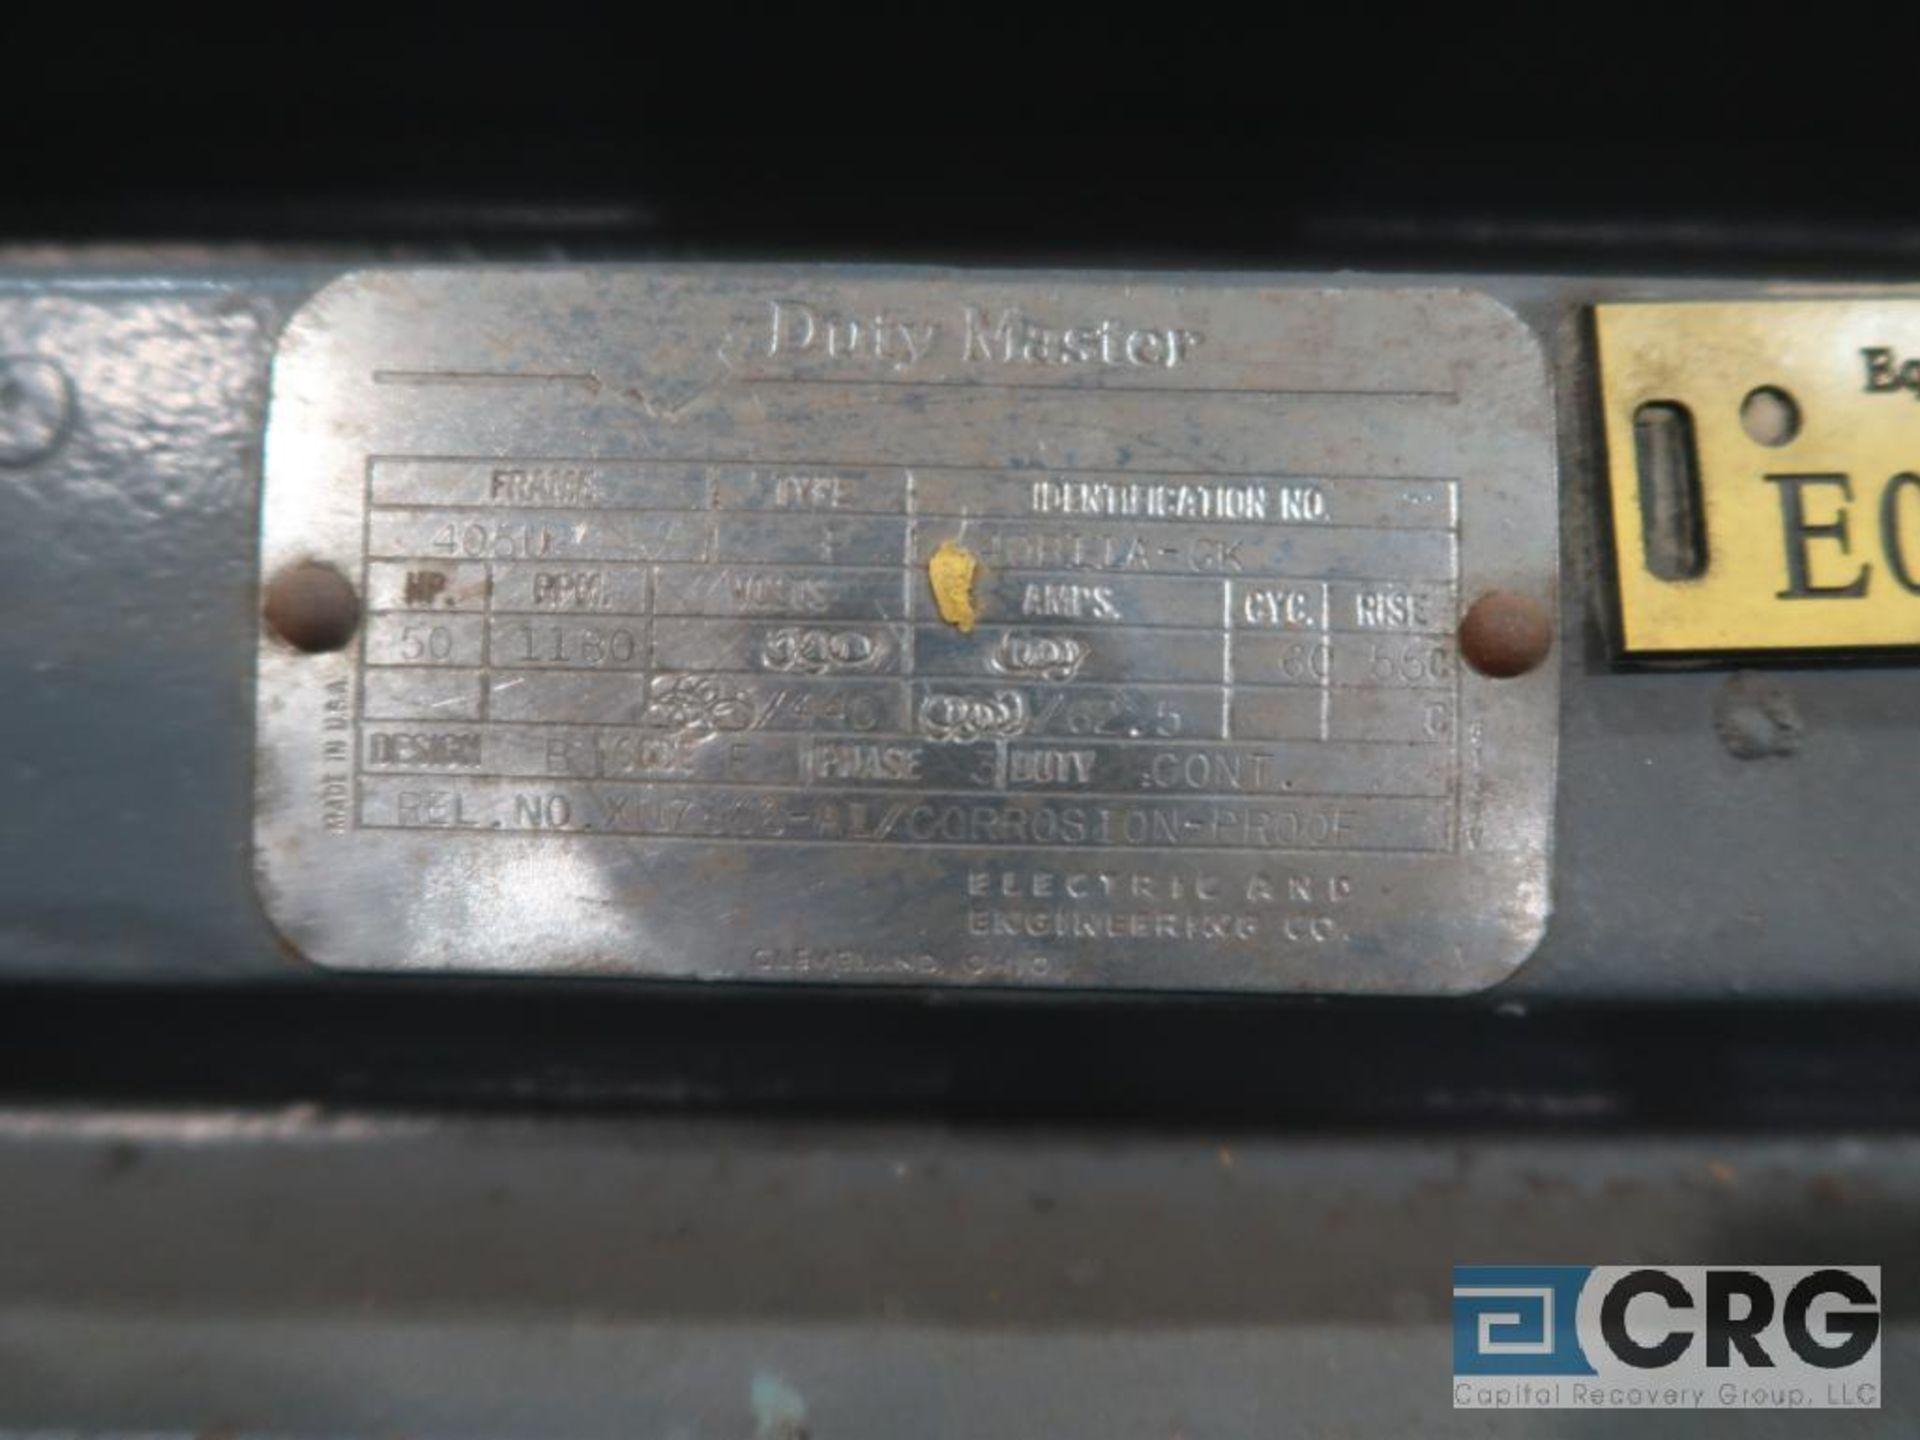 Reliance Duty Master motor, 50 HP, 1,180 RPMs, 440 volt, 3 ph., 405U frame (Finish Building) - Image 2 of 2